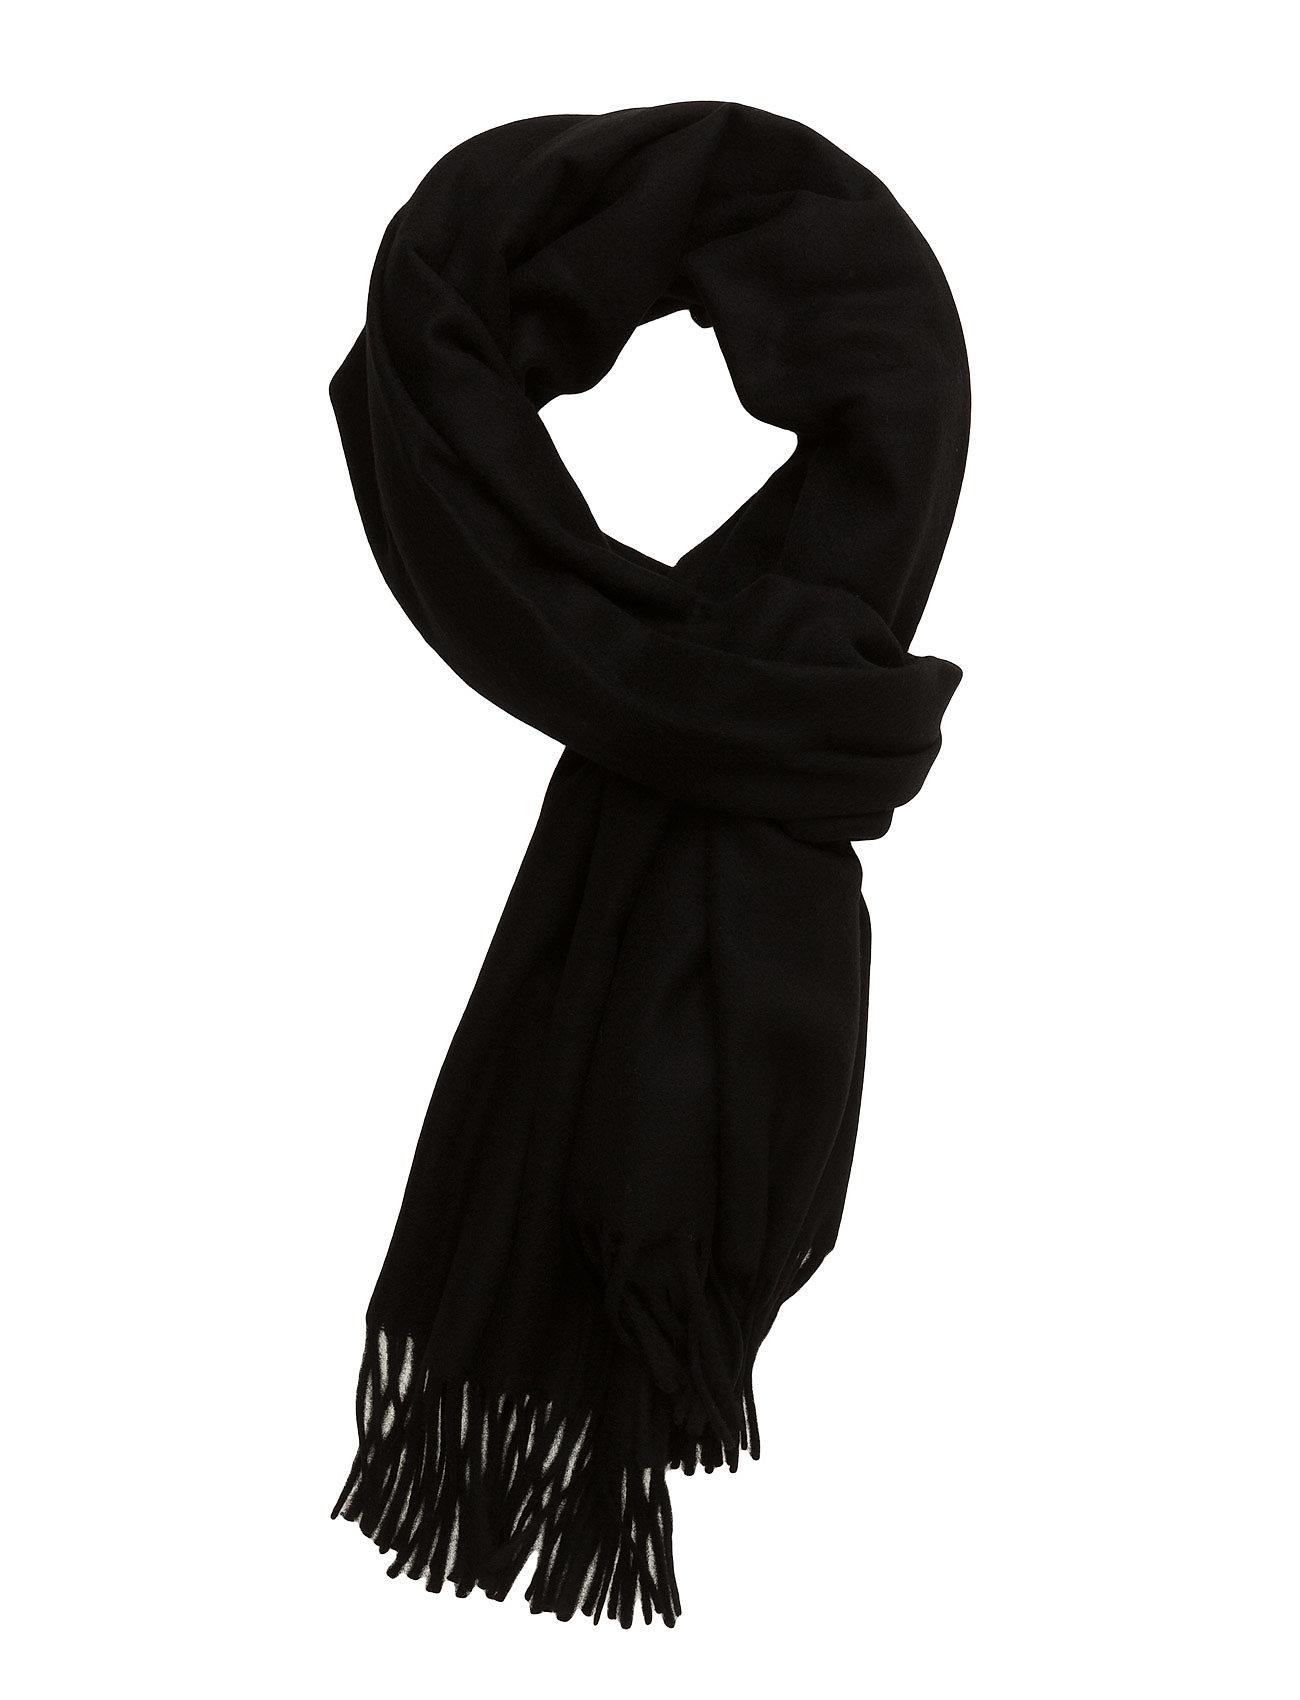 Samsøe & Samsøe Accola maxi scarf 2862 - BLACK